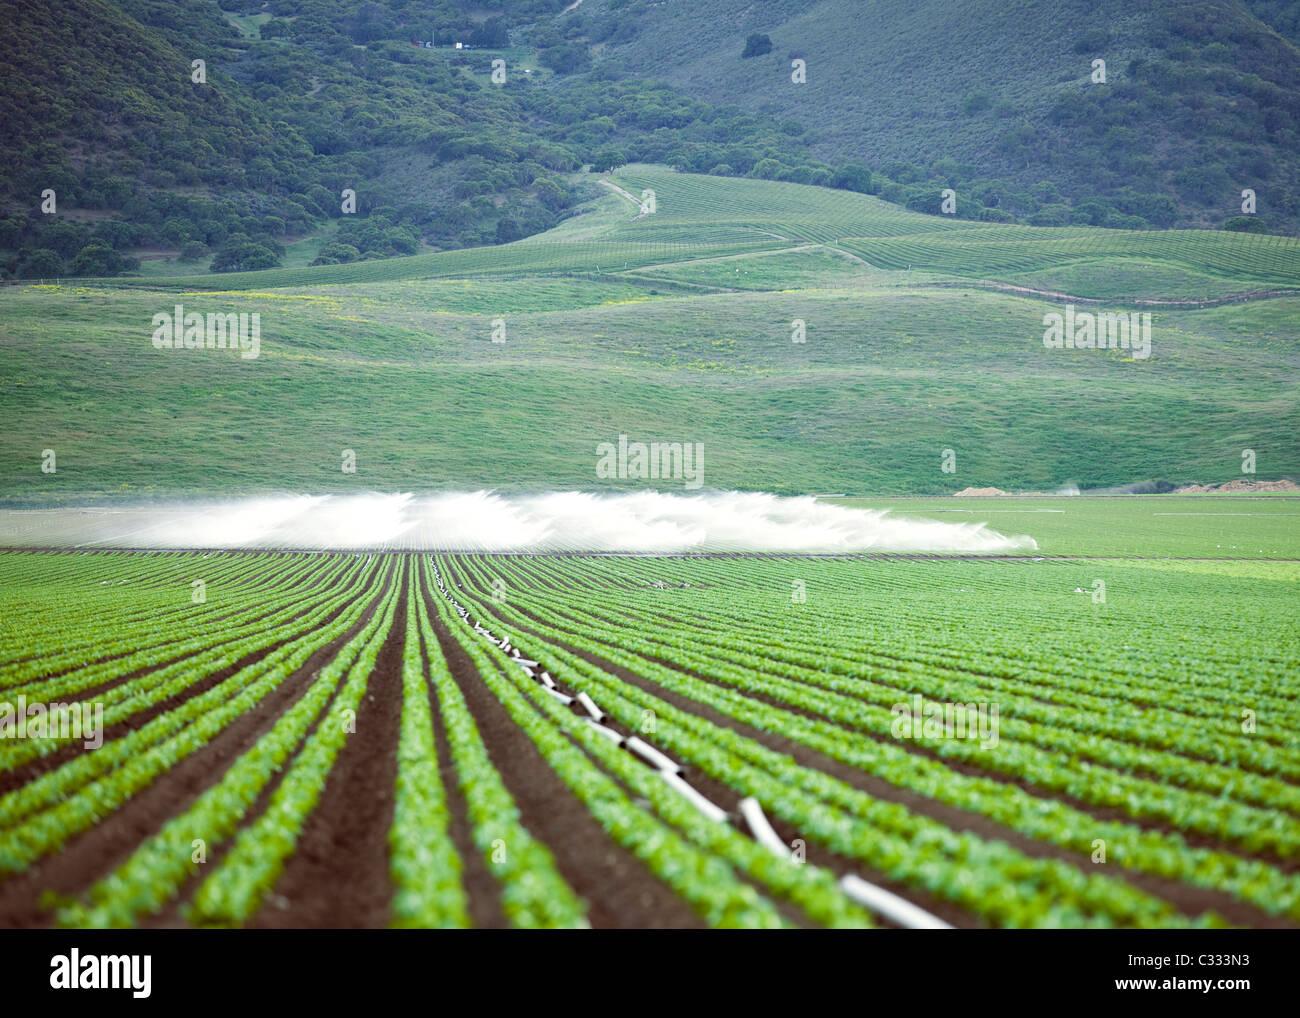 Irrigation on large vegetable farm - Stock Image